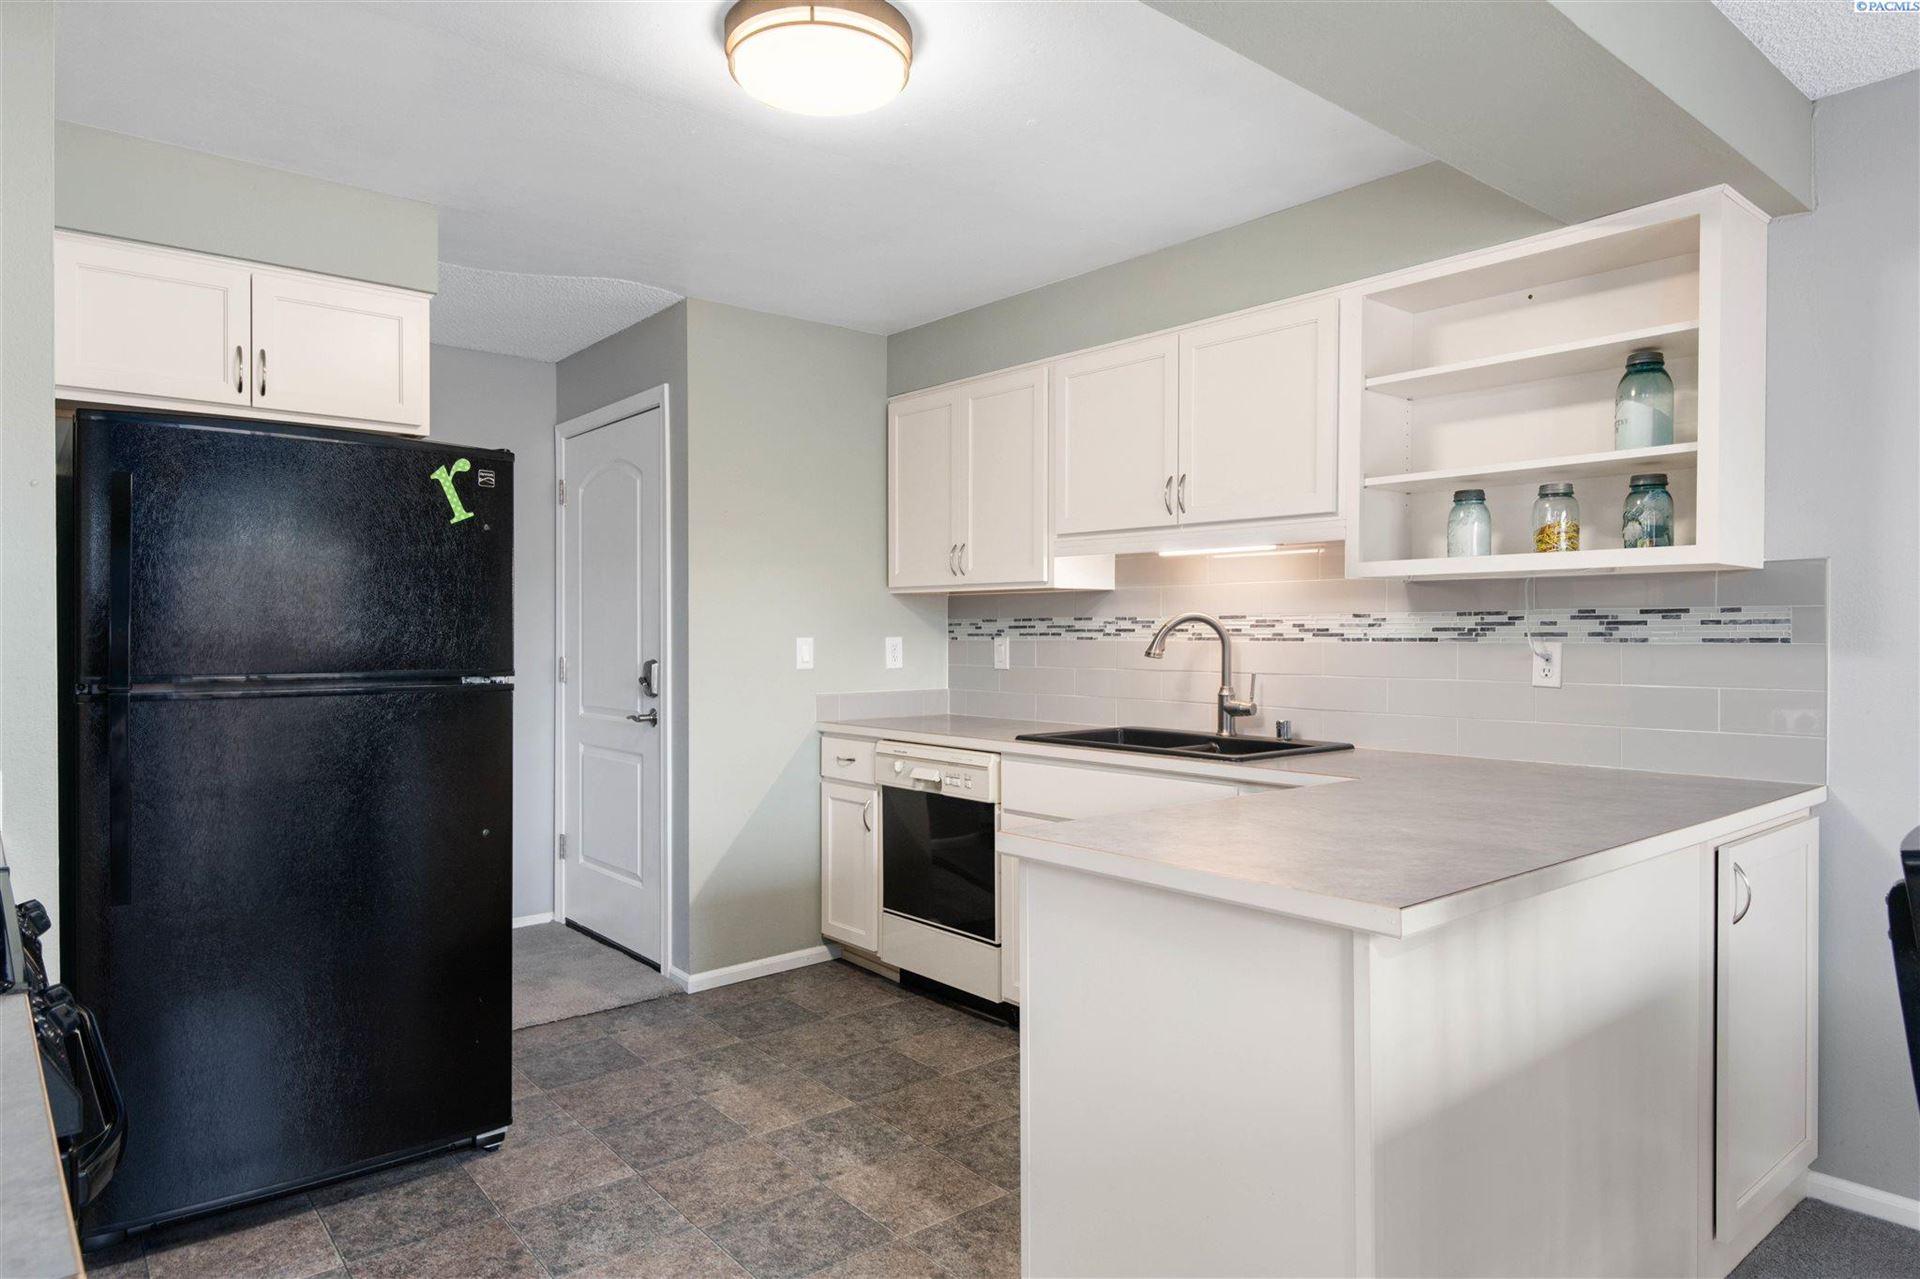 Photo of 3121 W Hood Avenue #B201, Kennewick, WA 99336 (MLS # 254341)